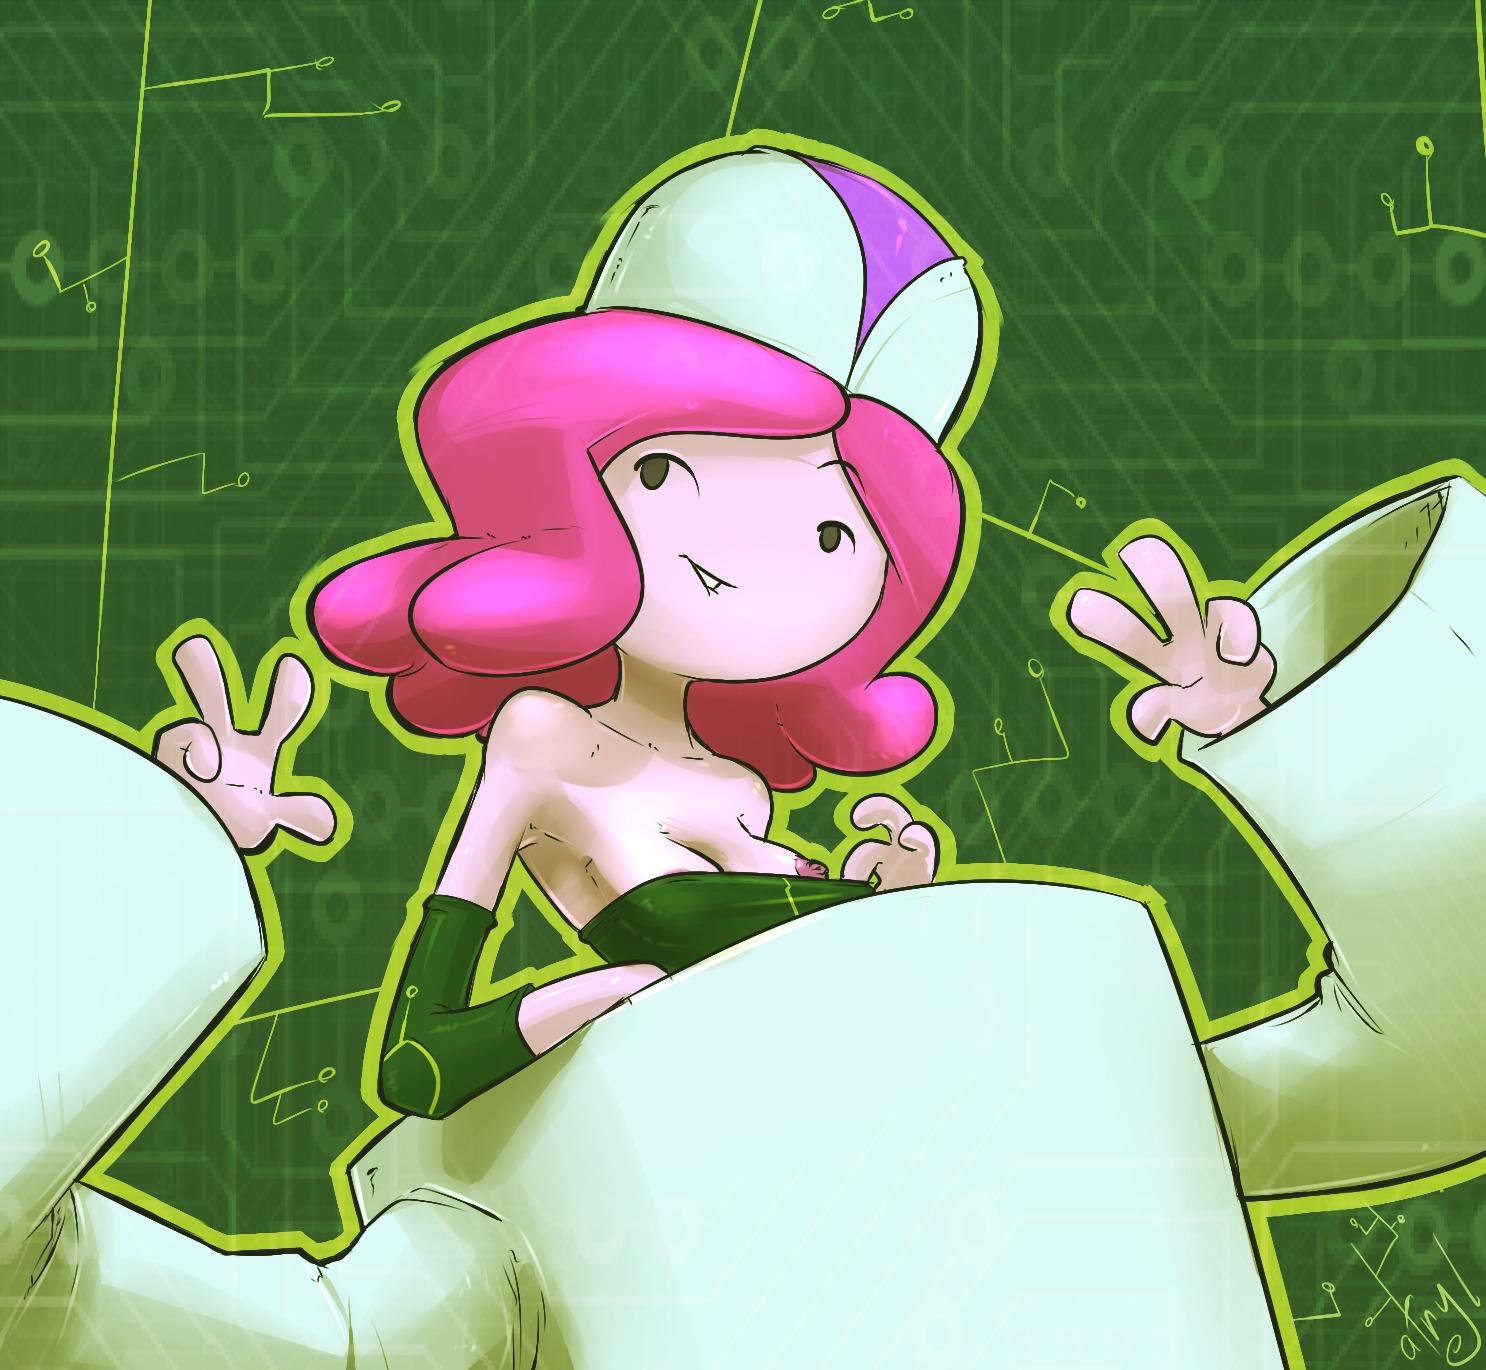 1153142_-_adventure_time_princess_bubblegum_atryl